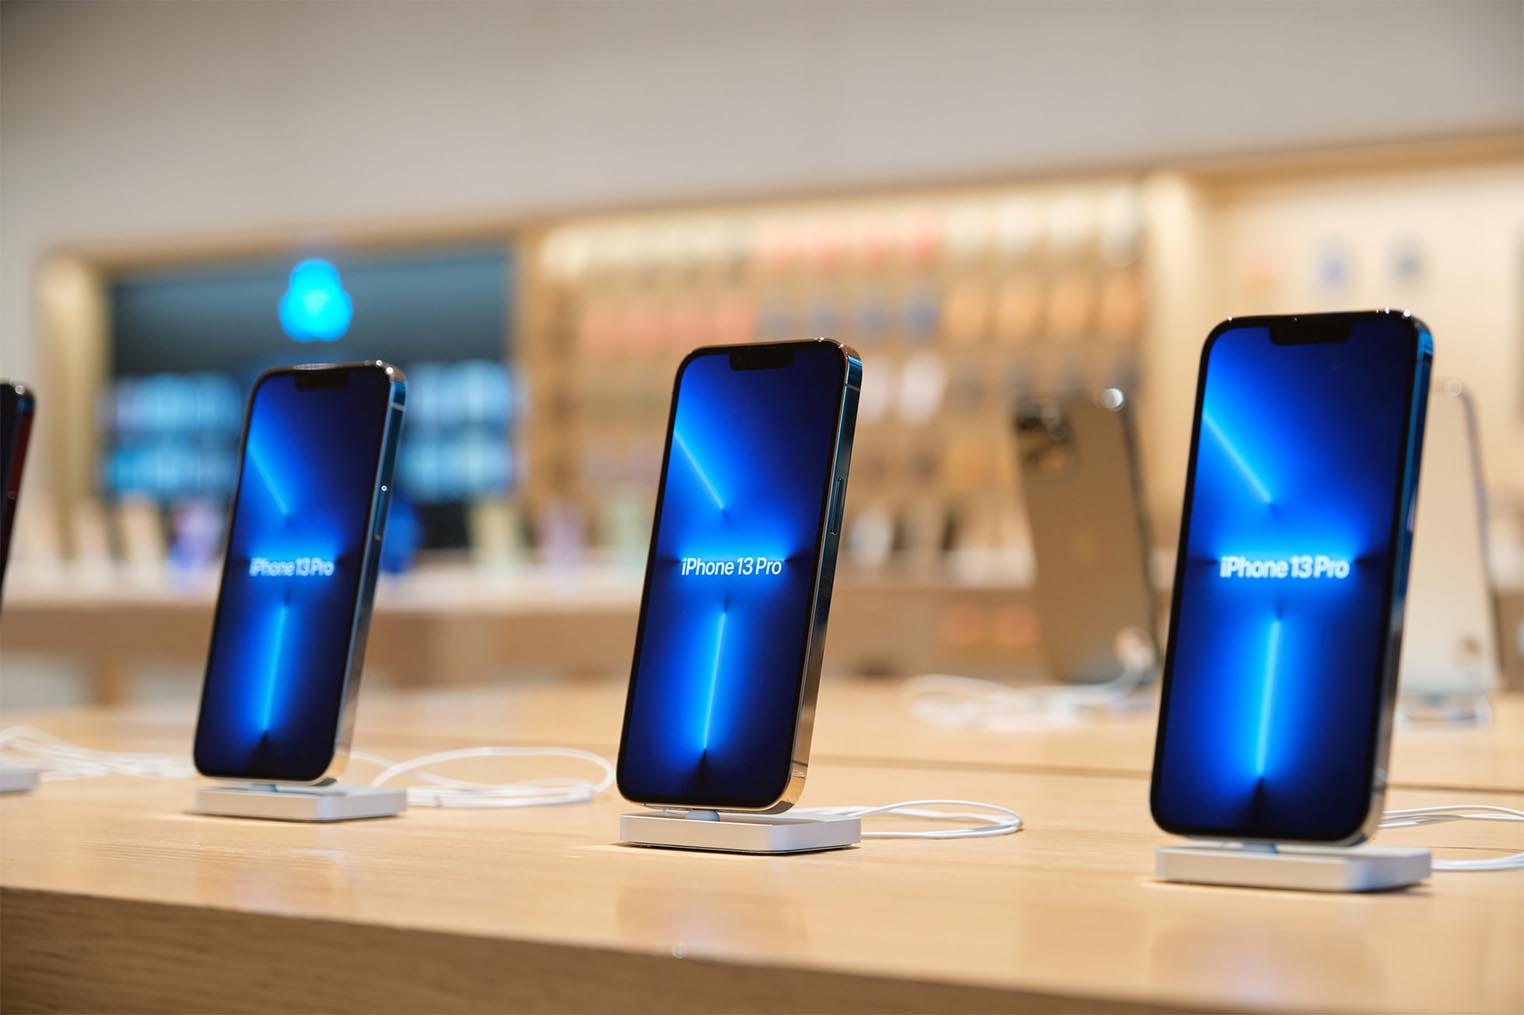 iPhone 13 Pro Apple Store